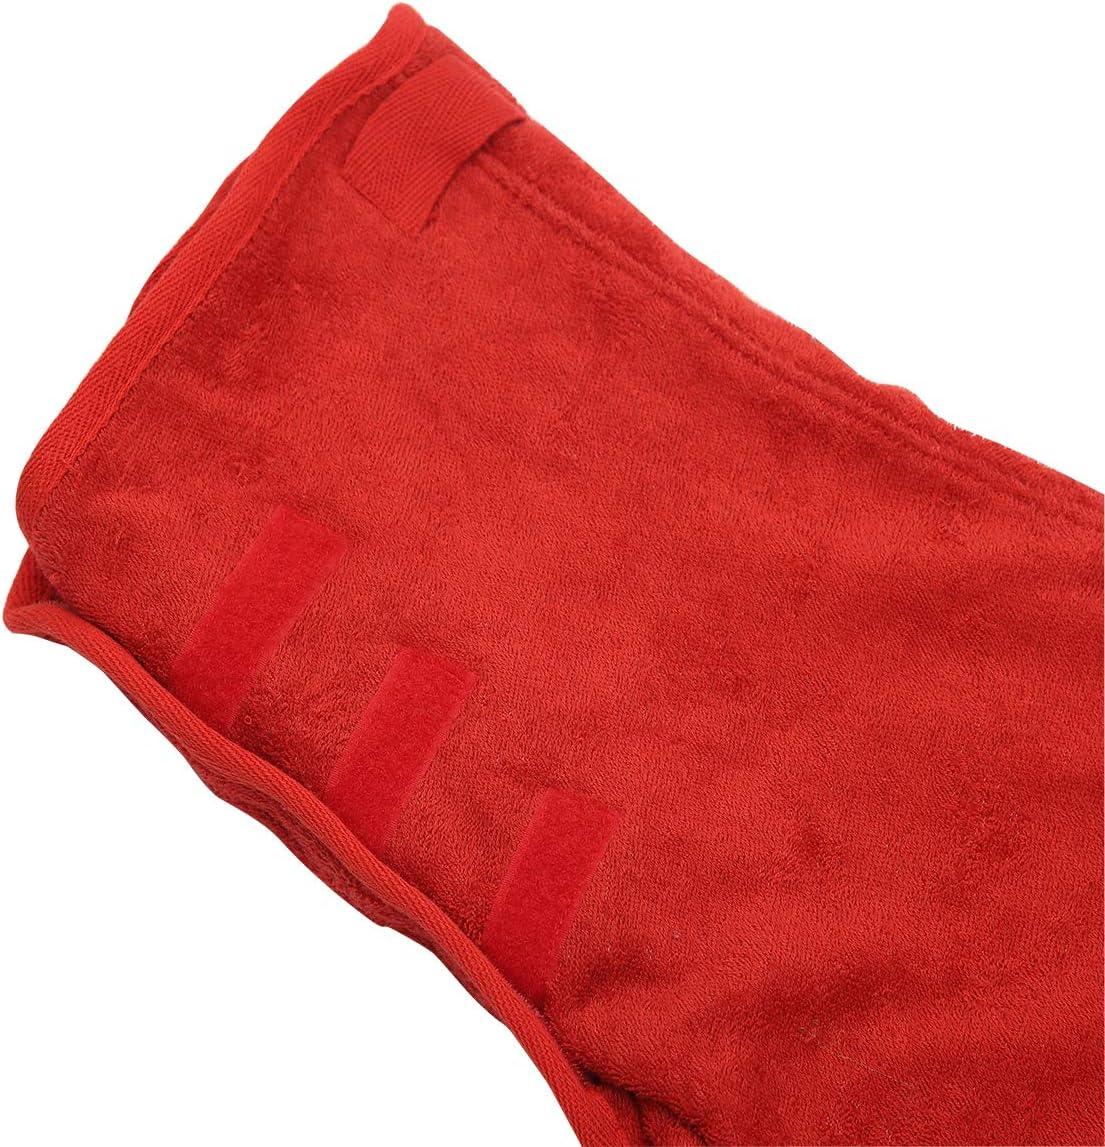 Geyecete Dog Drying Coat Dry Fast Dog Bag Red-XL C628 Dog Bathrobe Towel-Microfibre Fast Drying Super Absorbent Pet Dog Cat Bath Robe Towel